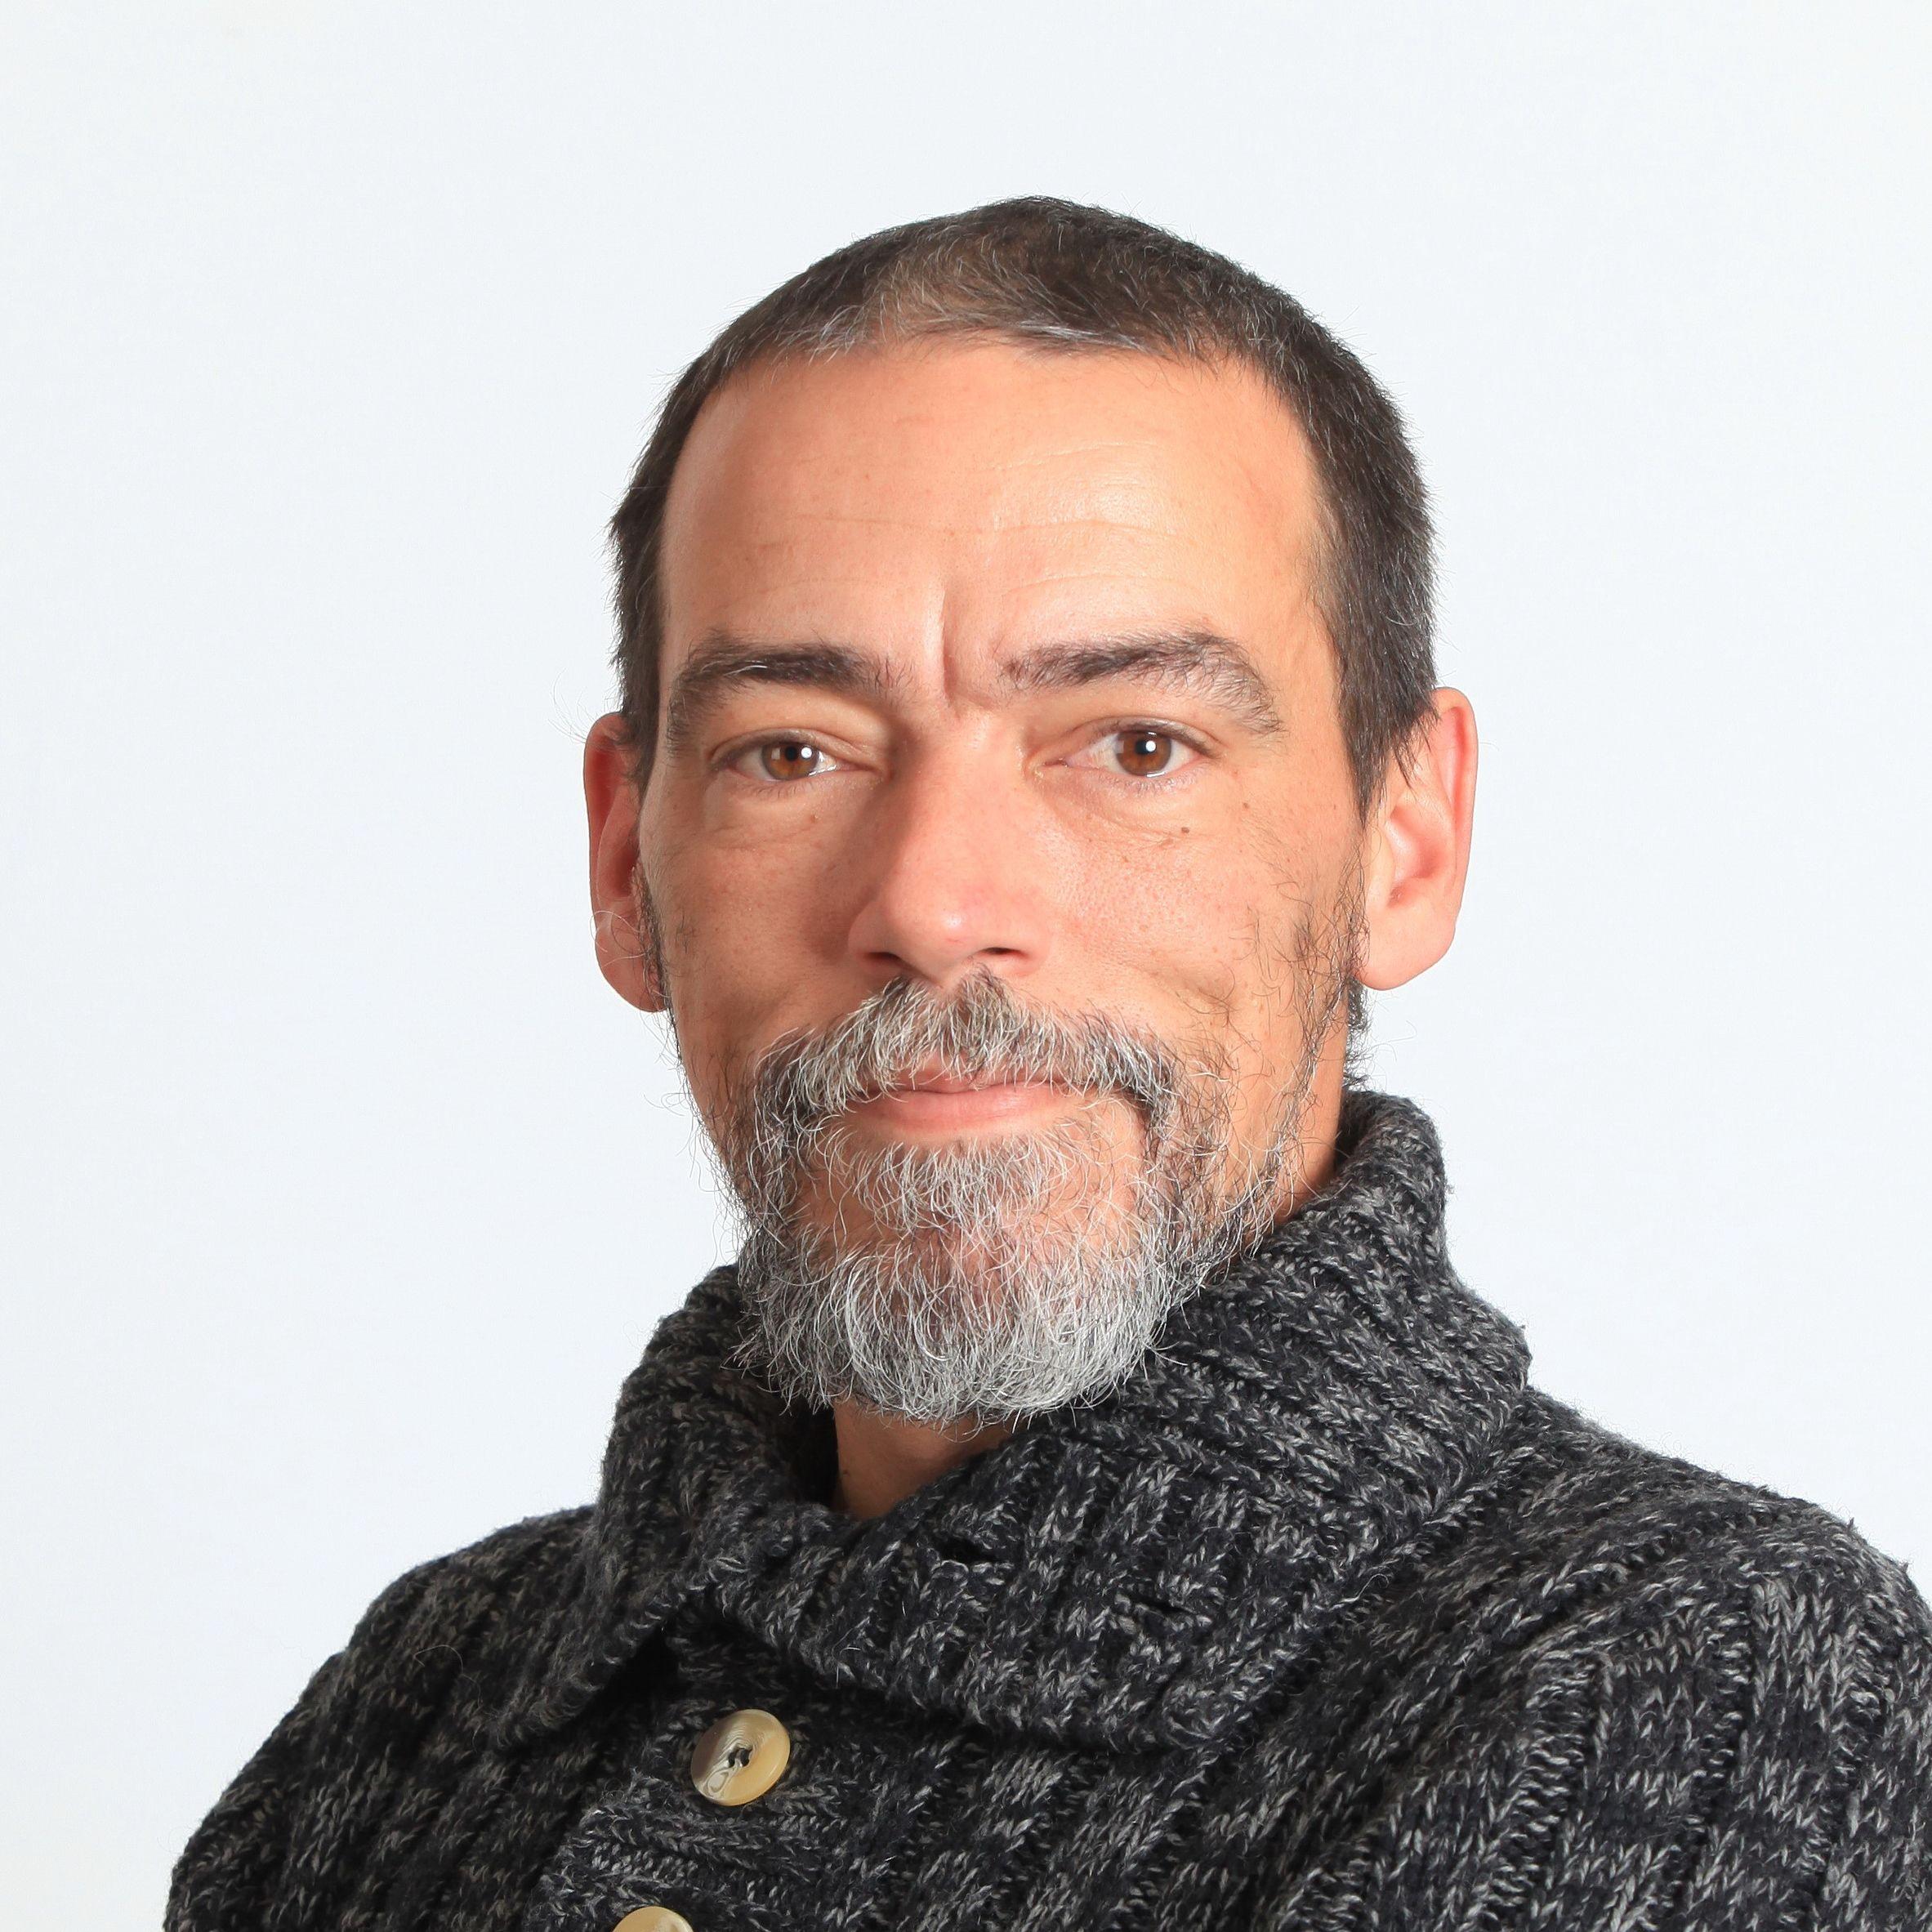 Carlos Daniel Enjuto Domínguez